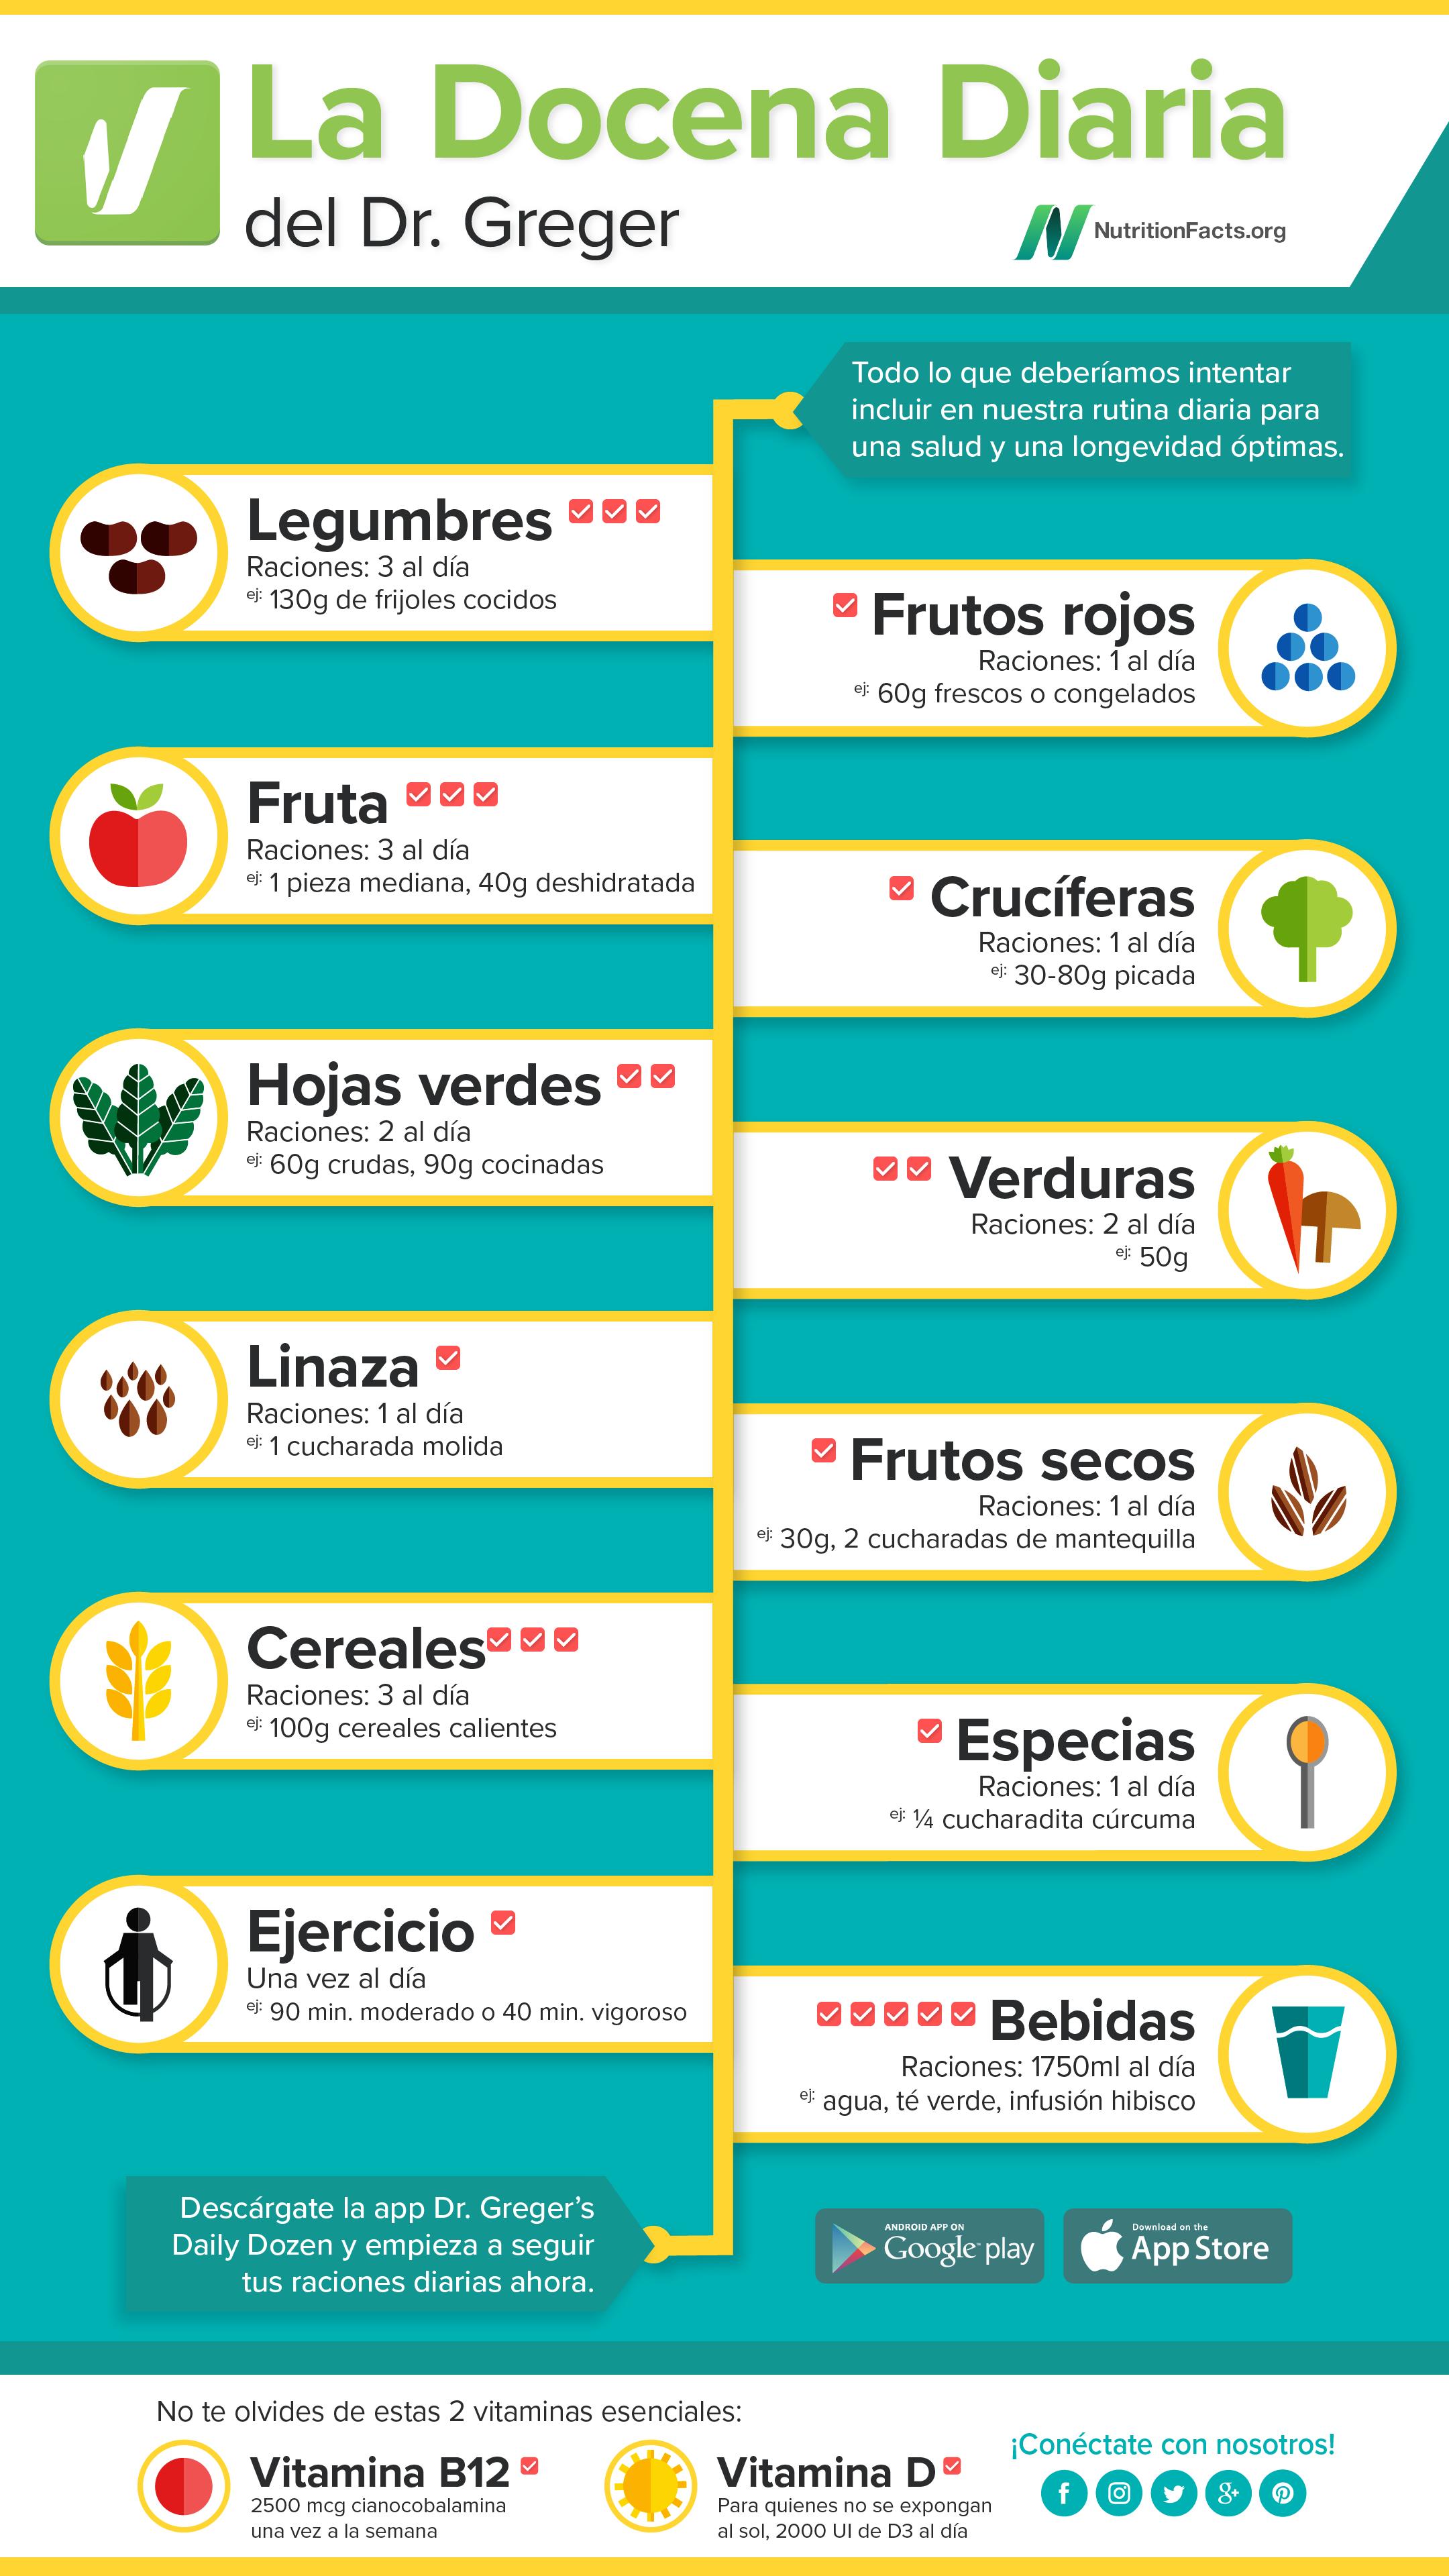 Ser vegetariano mola mas - Página 10 Infographic